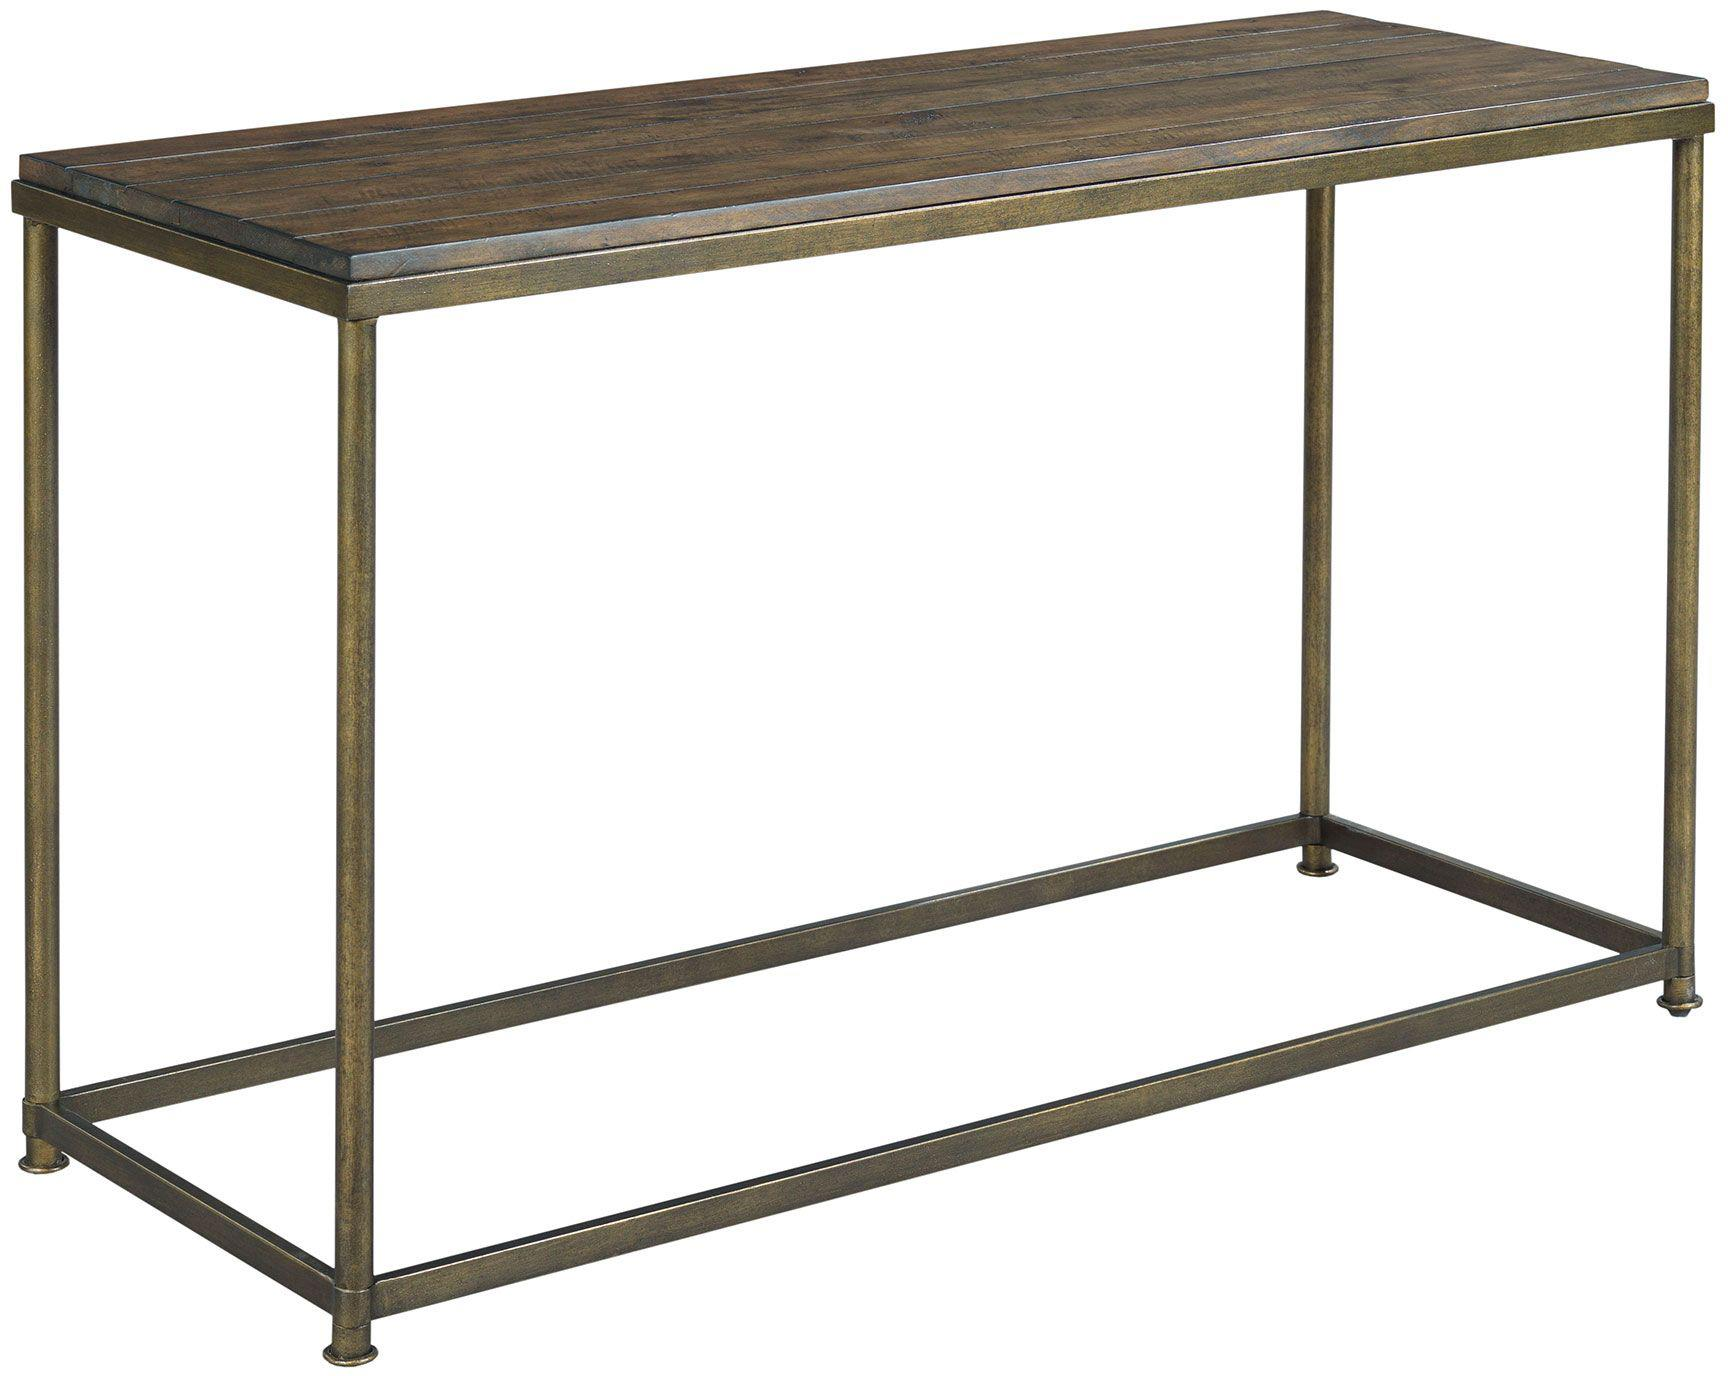 Leone Sofa Table by Hammary at Stoney Creek Furniture